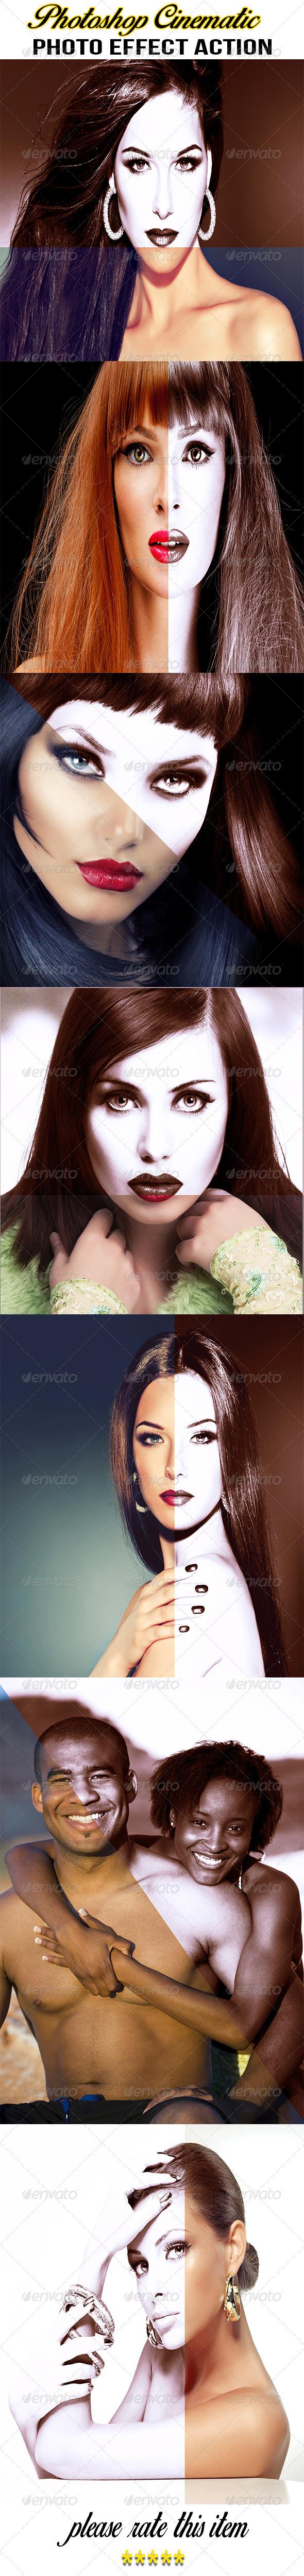 GraphicRiver Photoshop Cinematic Photo Effect Action 8518857